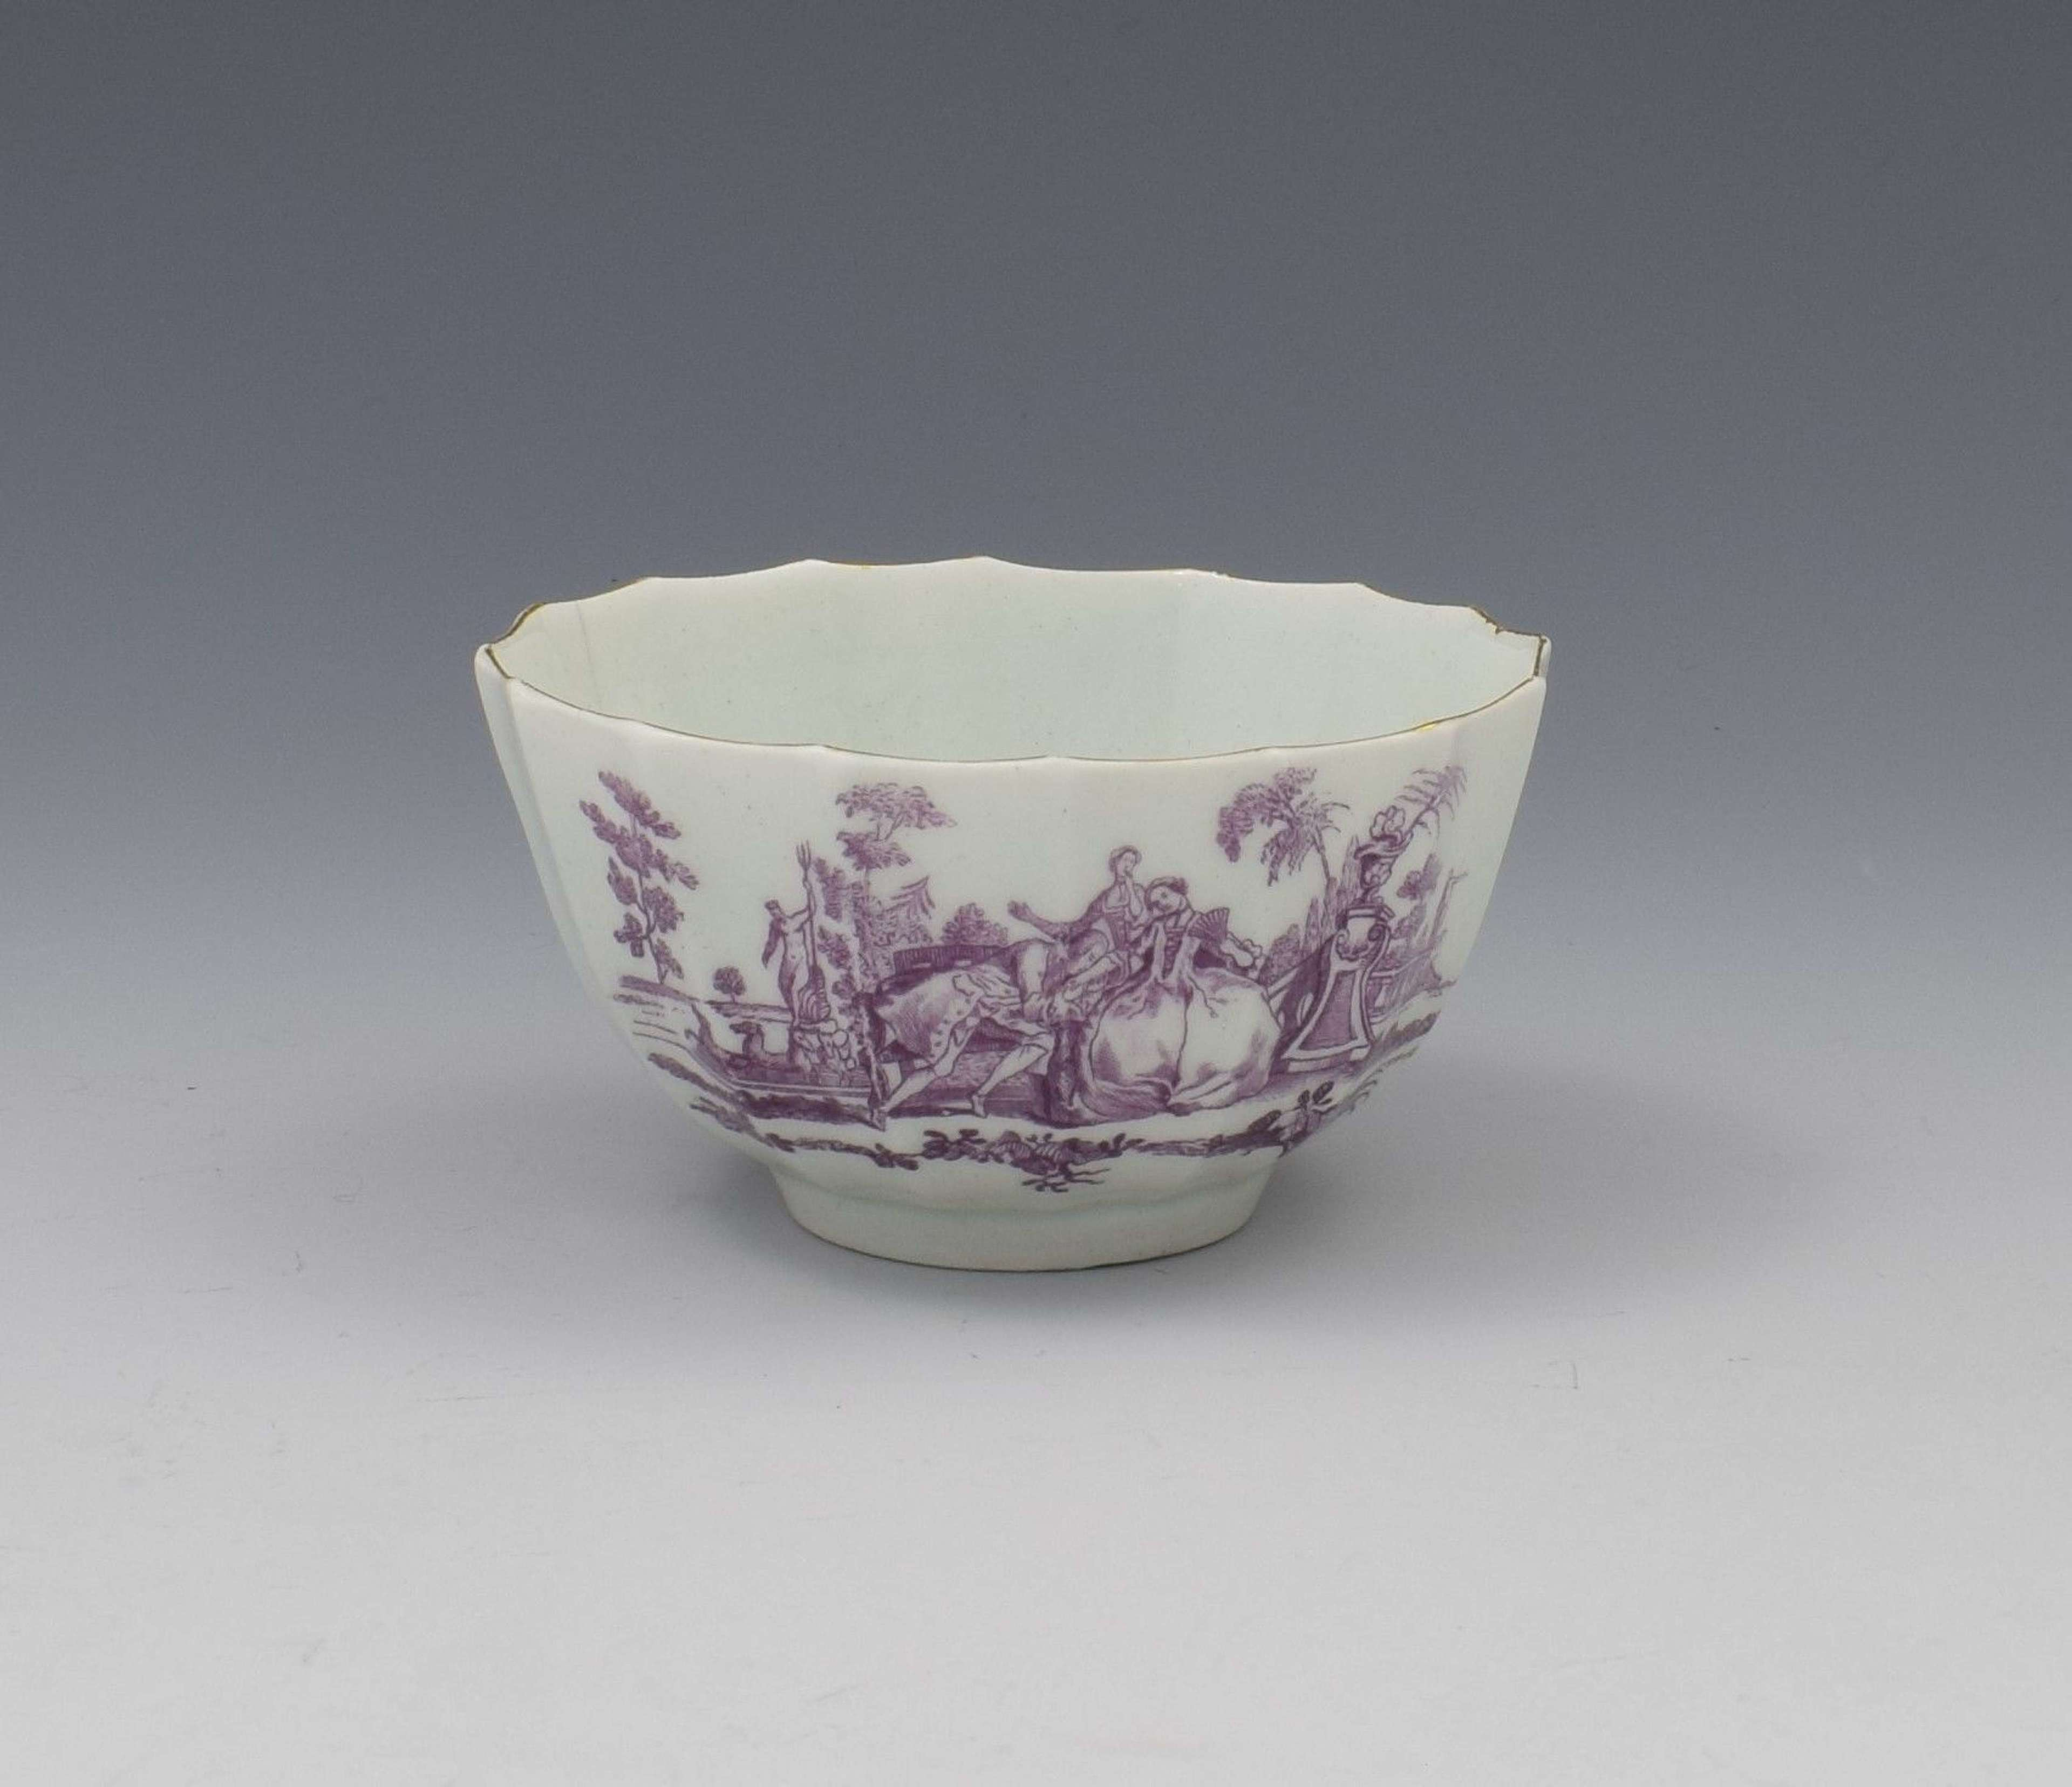 Rare Worcester Porcelain Lilac Printed L'Amour Tea Bowl